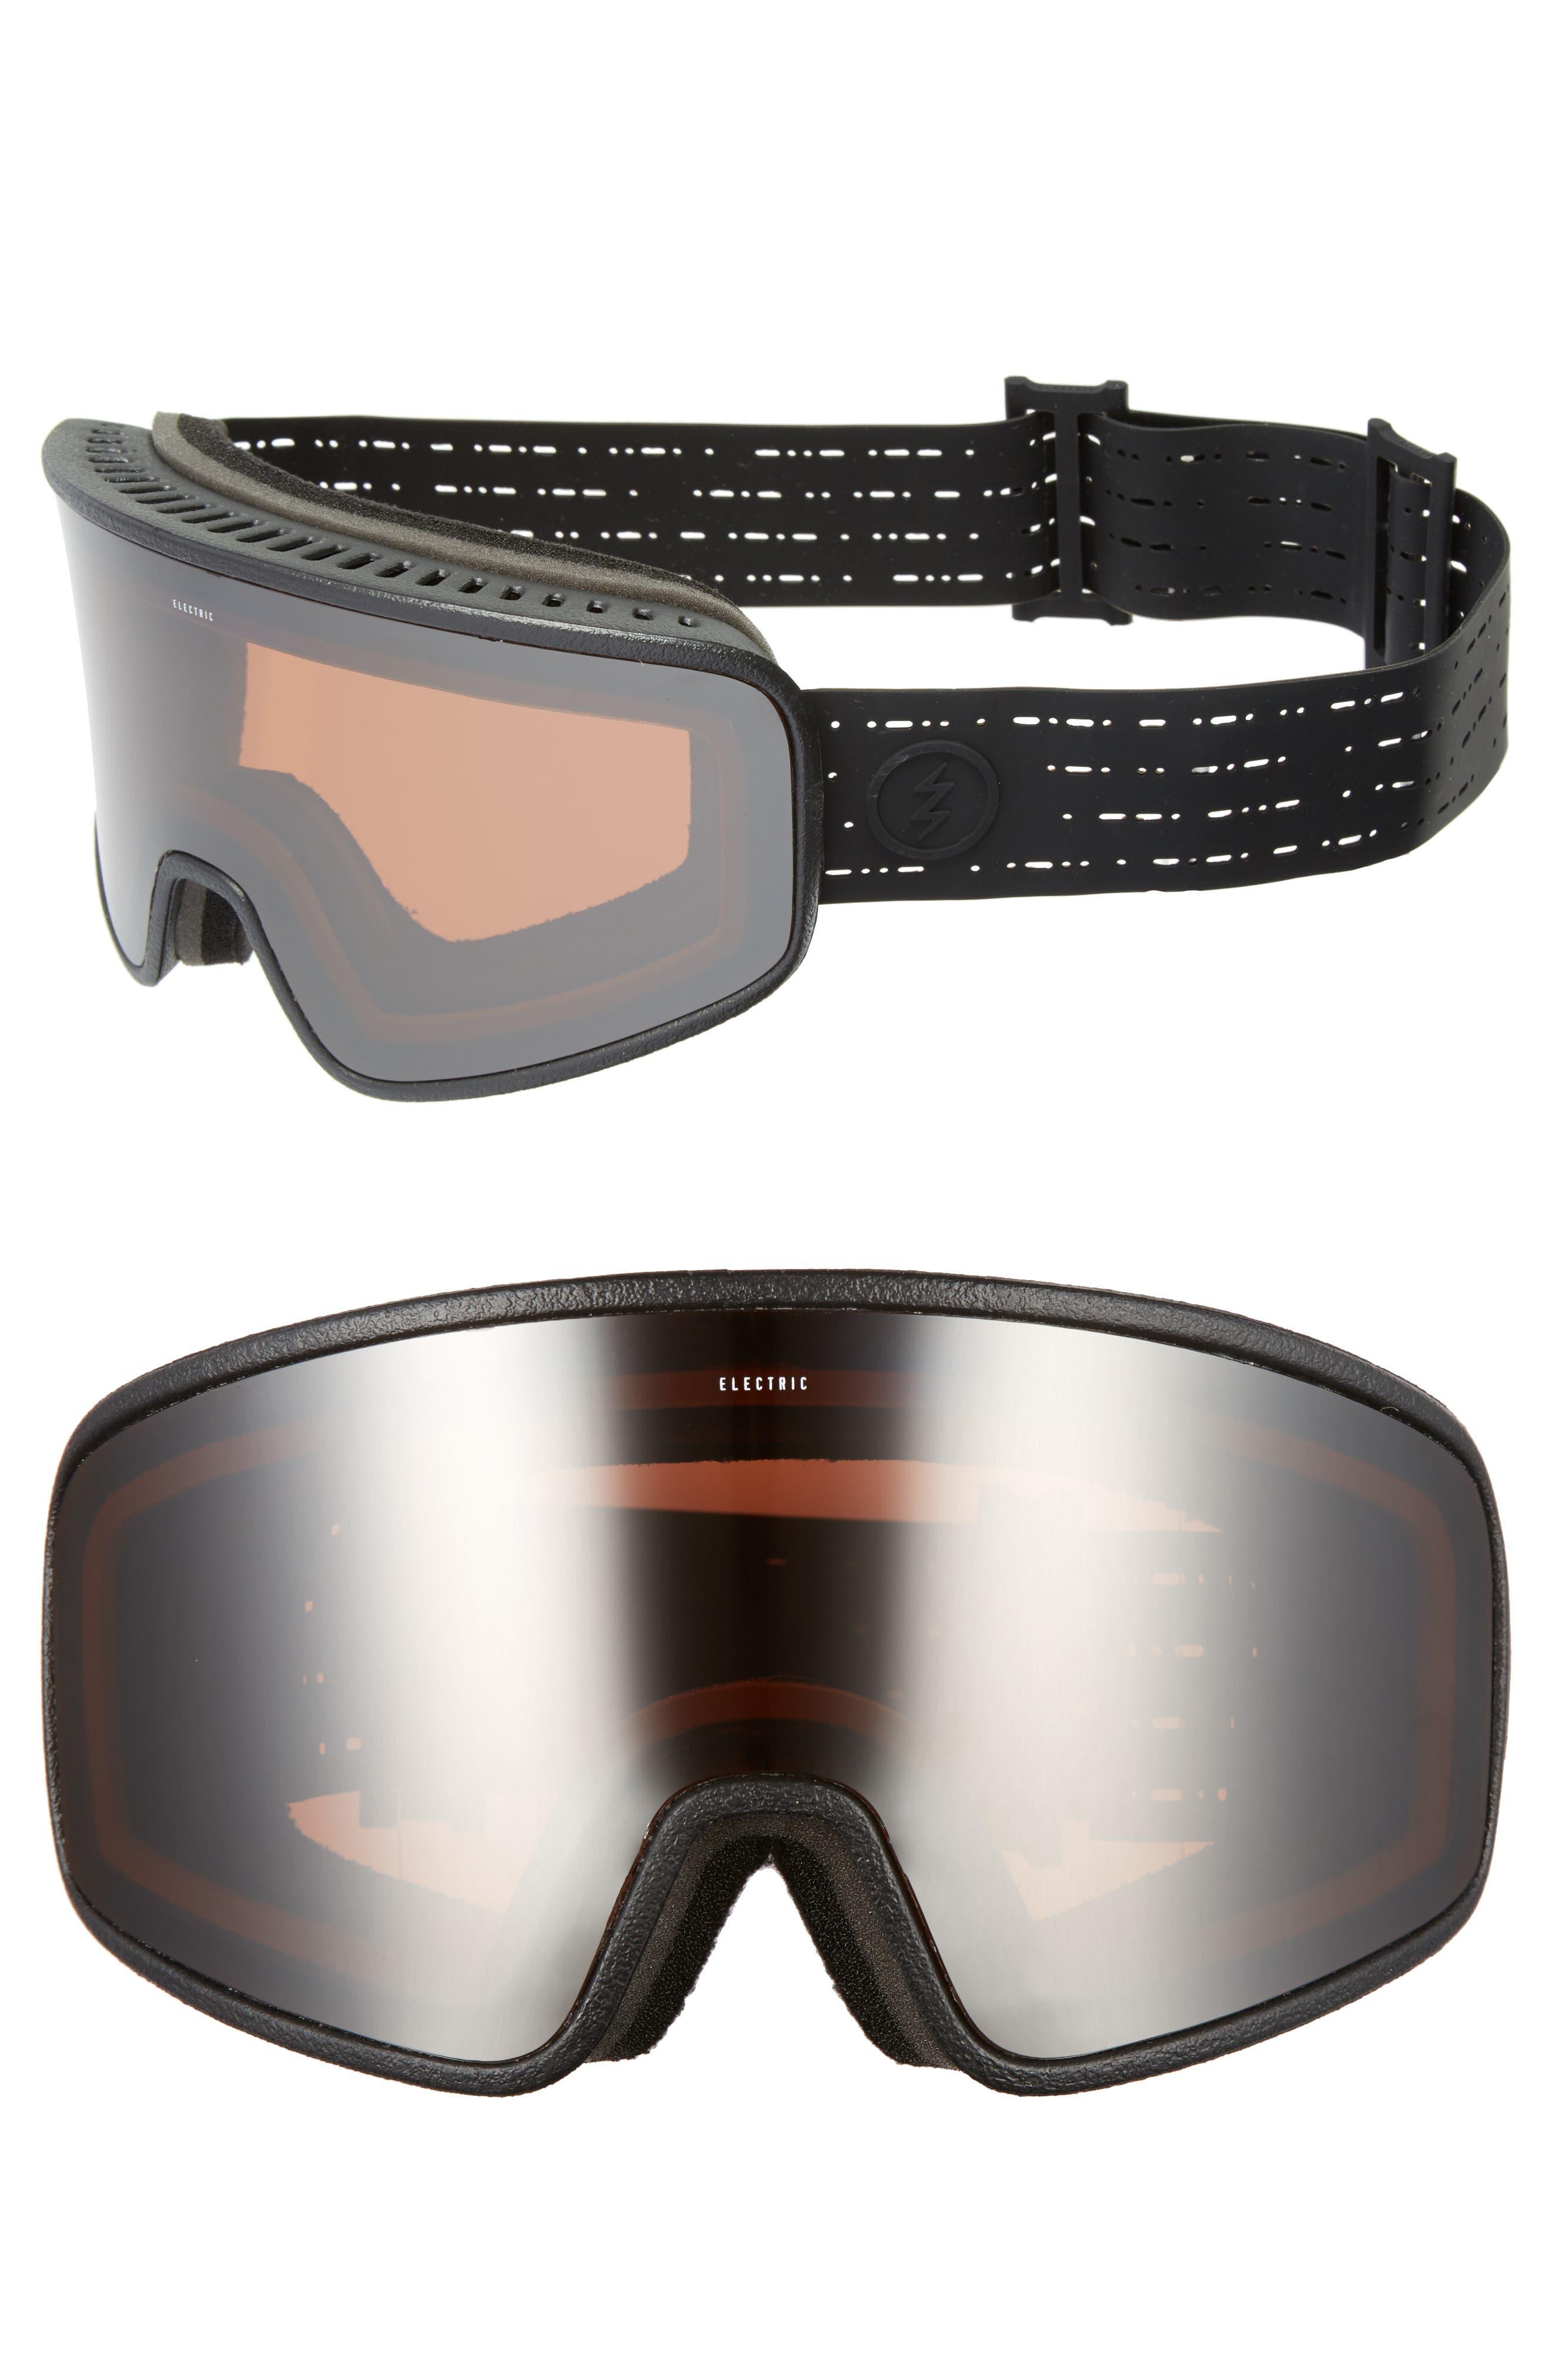 Electrolite 215mm Snow Goggles,                             Main thumbnail 1, color,                             002